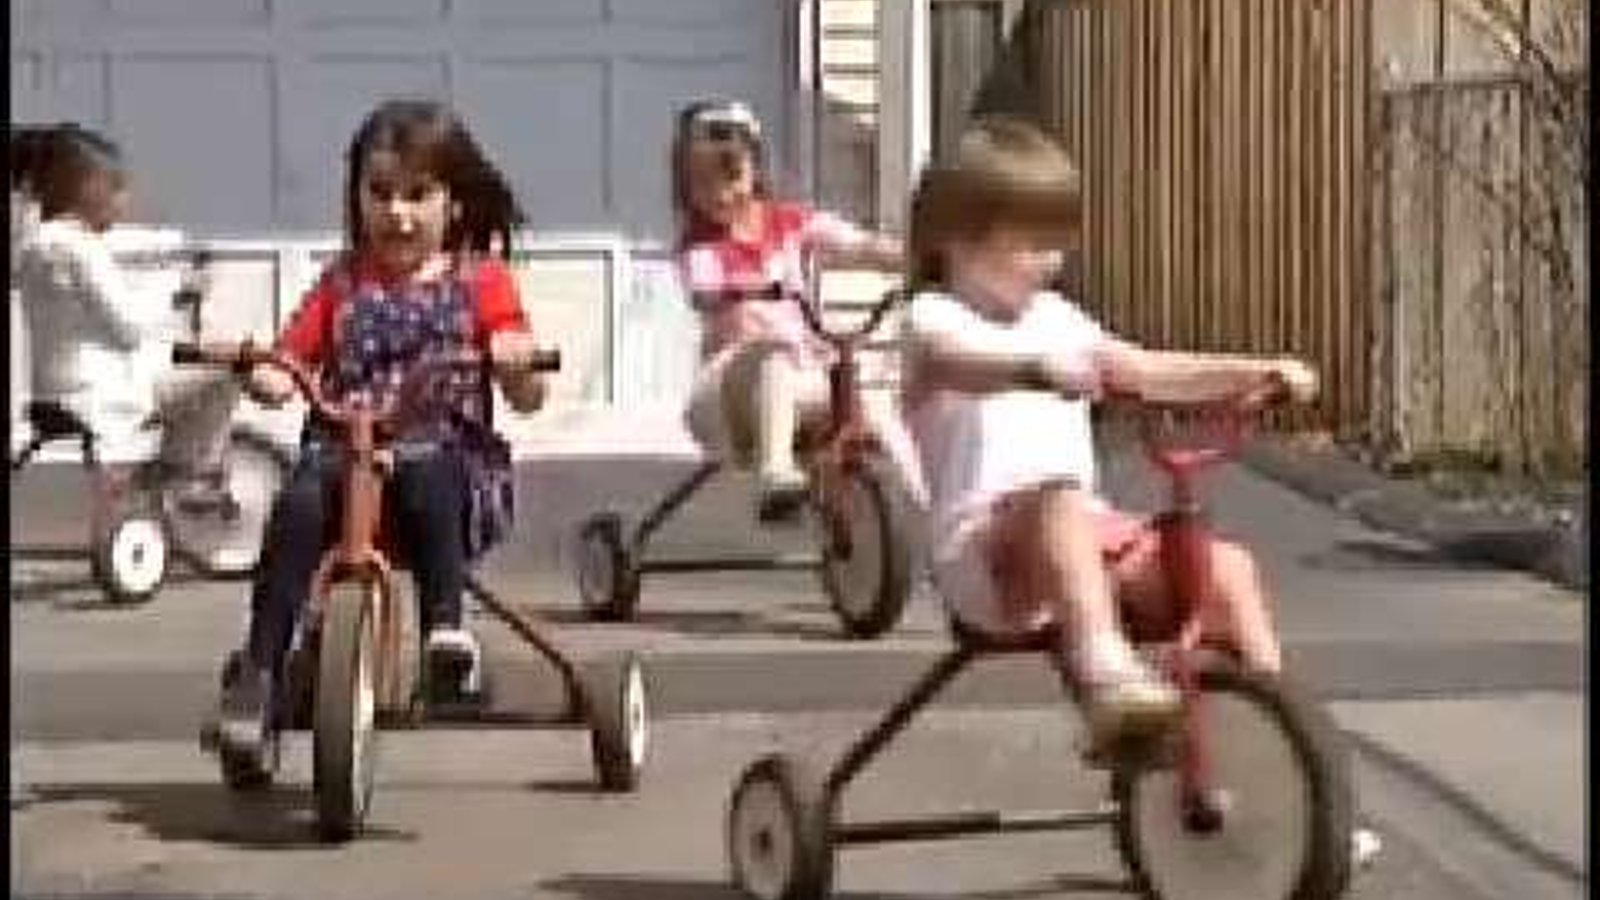 Preschoolers: Social and Emotional Development